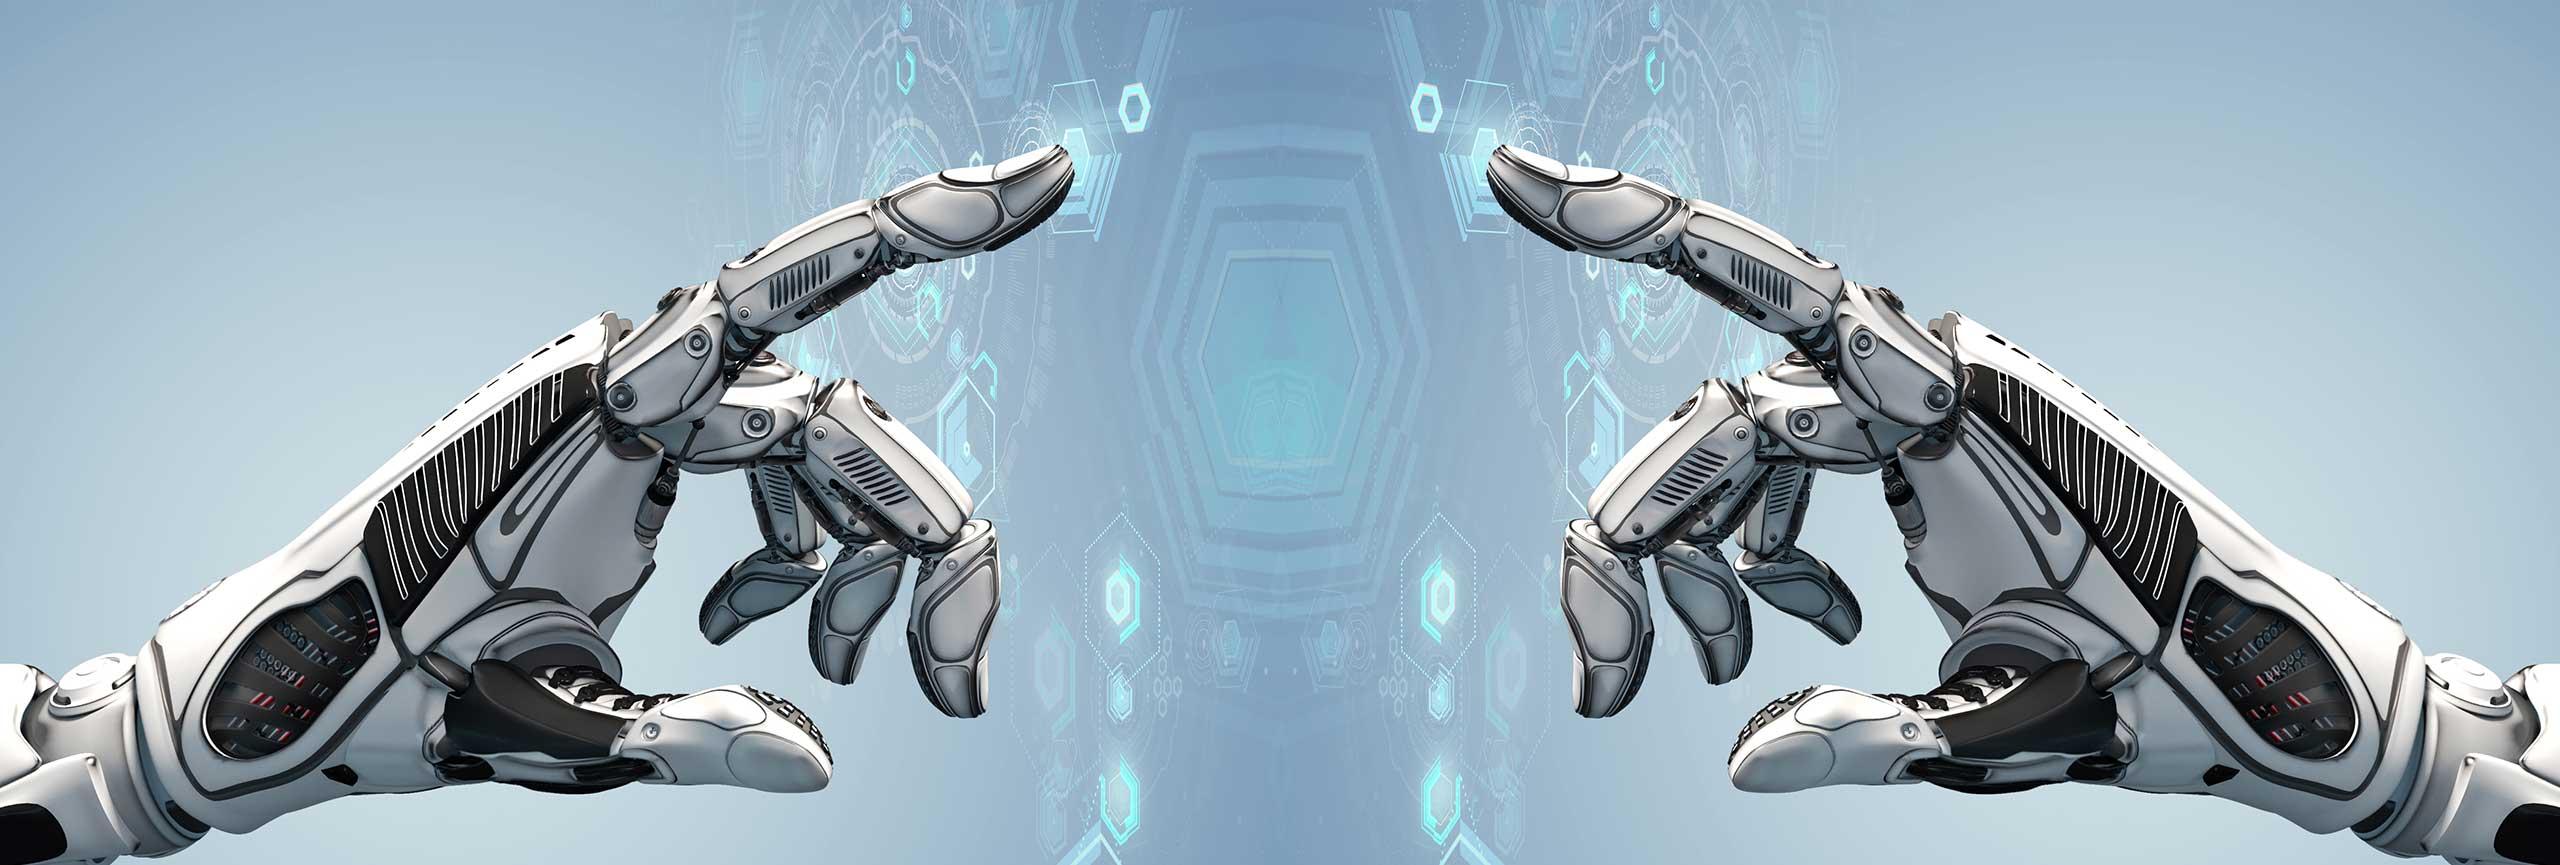 tecnologia_do_futuro